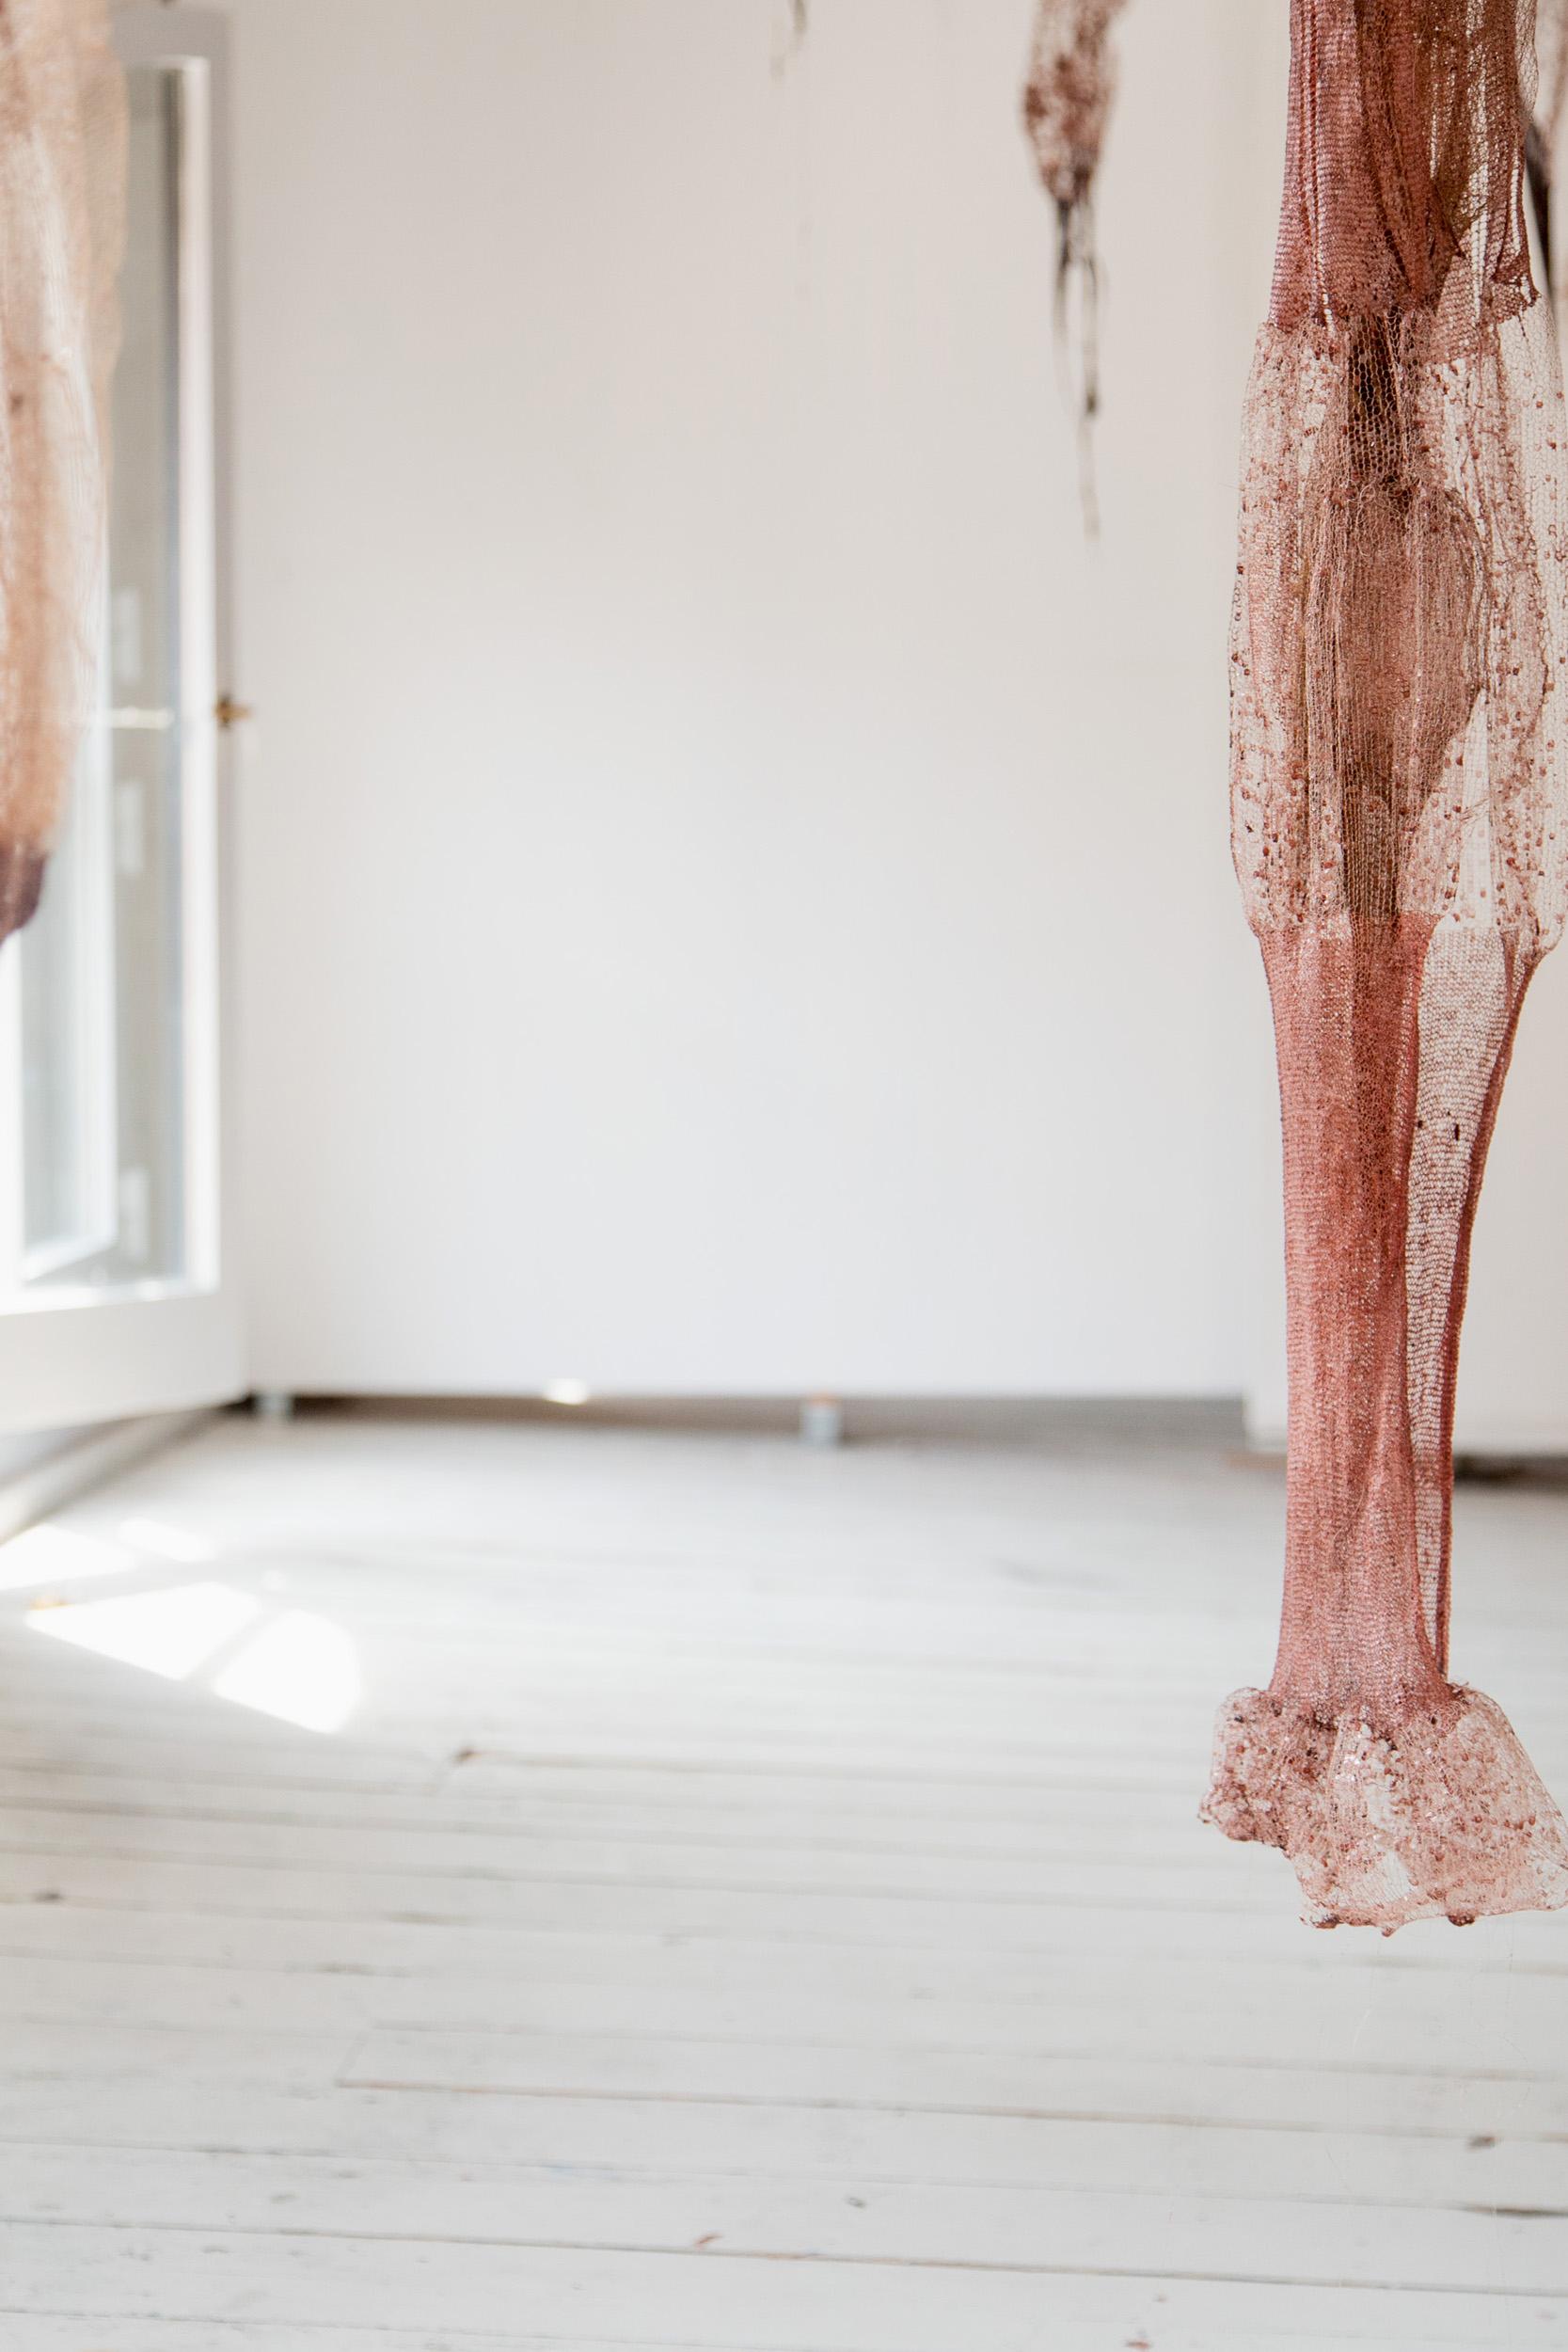 Marianne Johnstad - Process documentation for textile artist and designer Marianne Johnstad at The Danish Art Workshops.